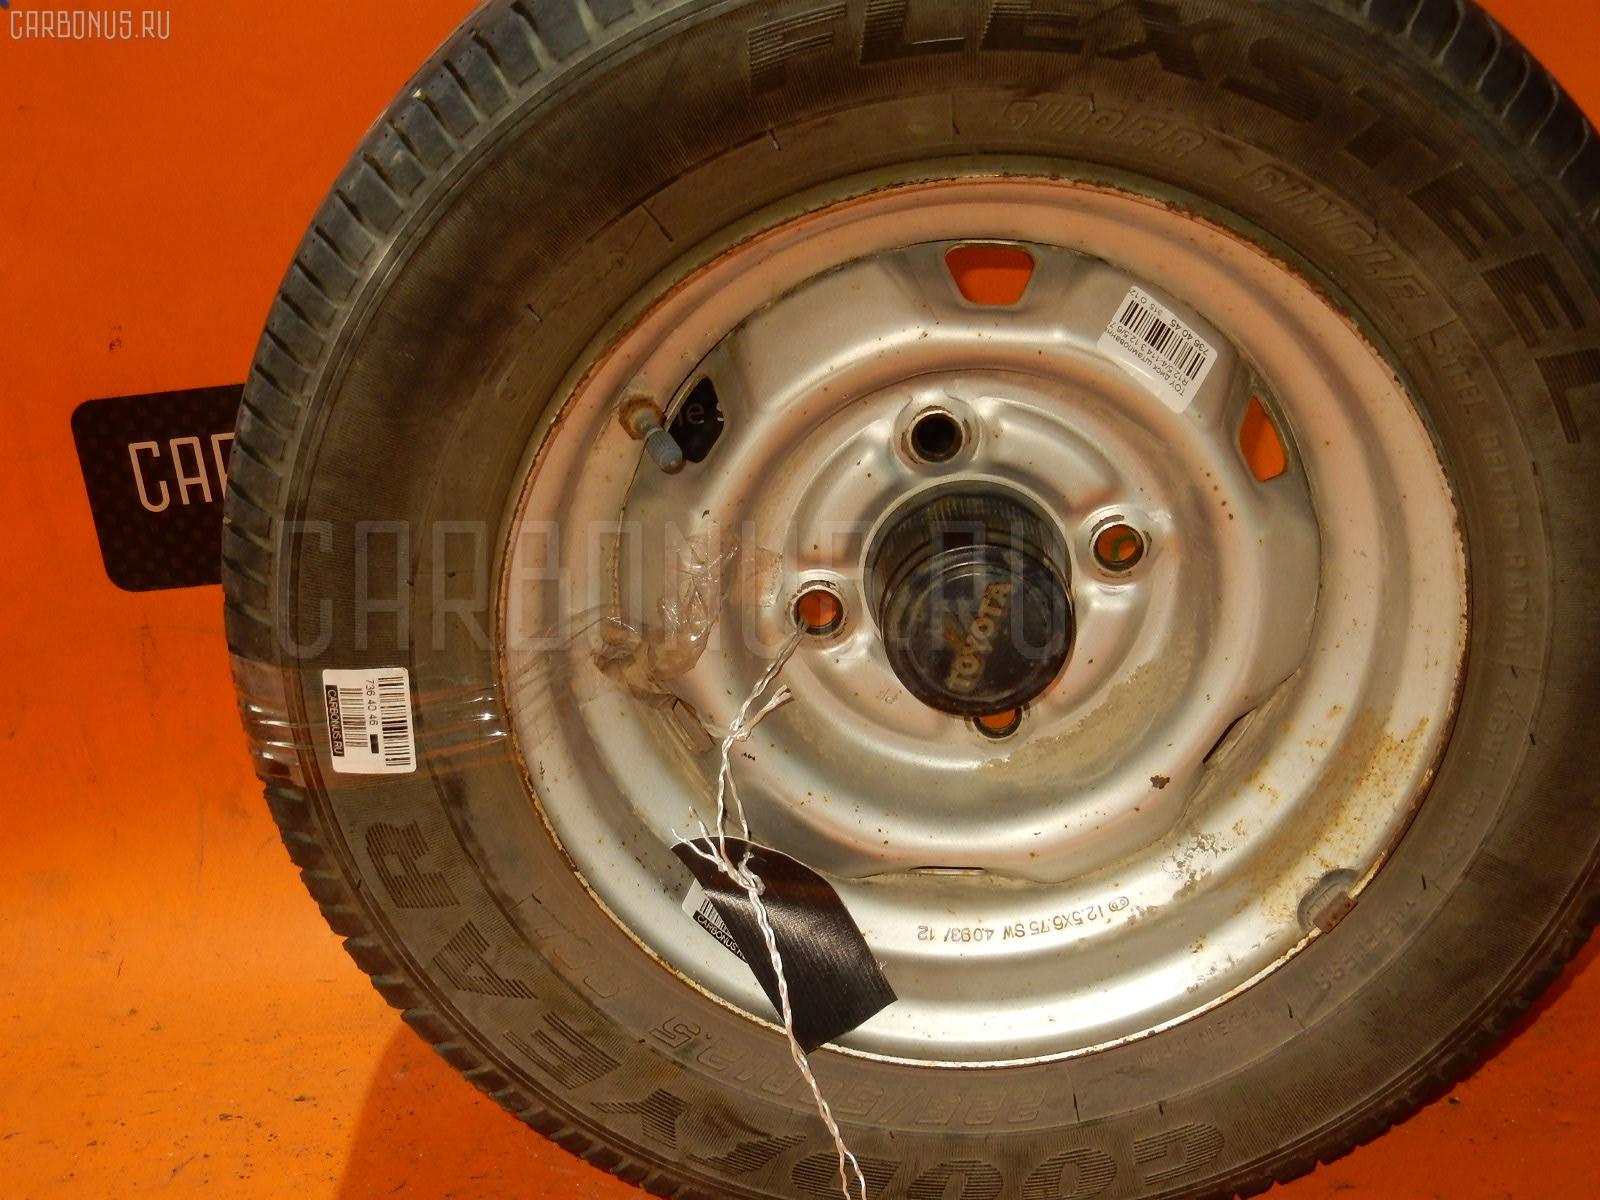 Диск штамповка грузовой R12.5LT / 4-114.3 Фото 1